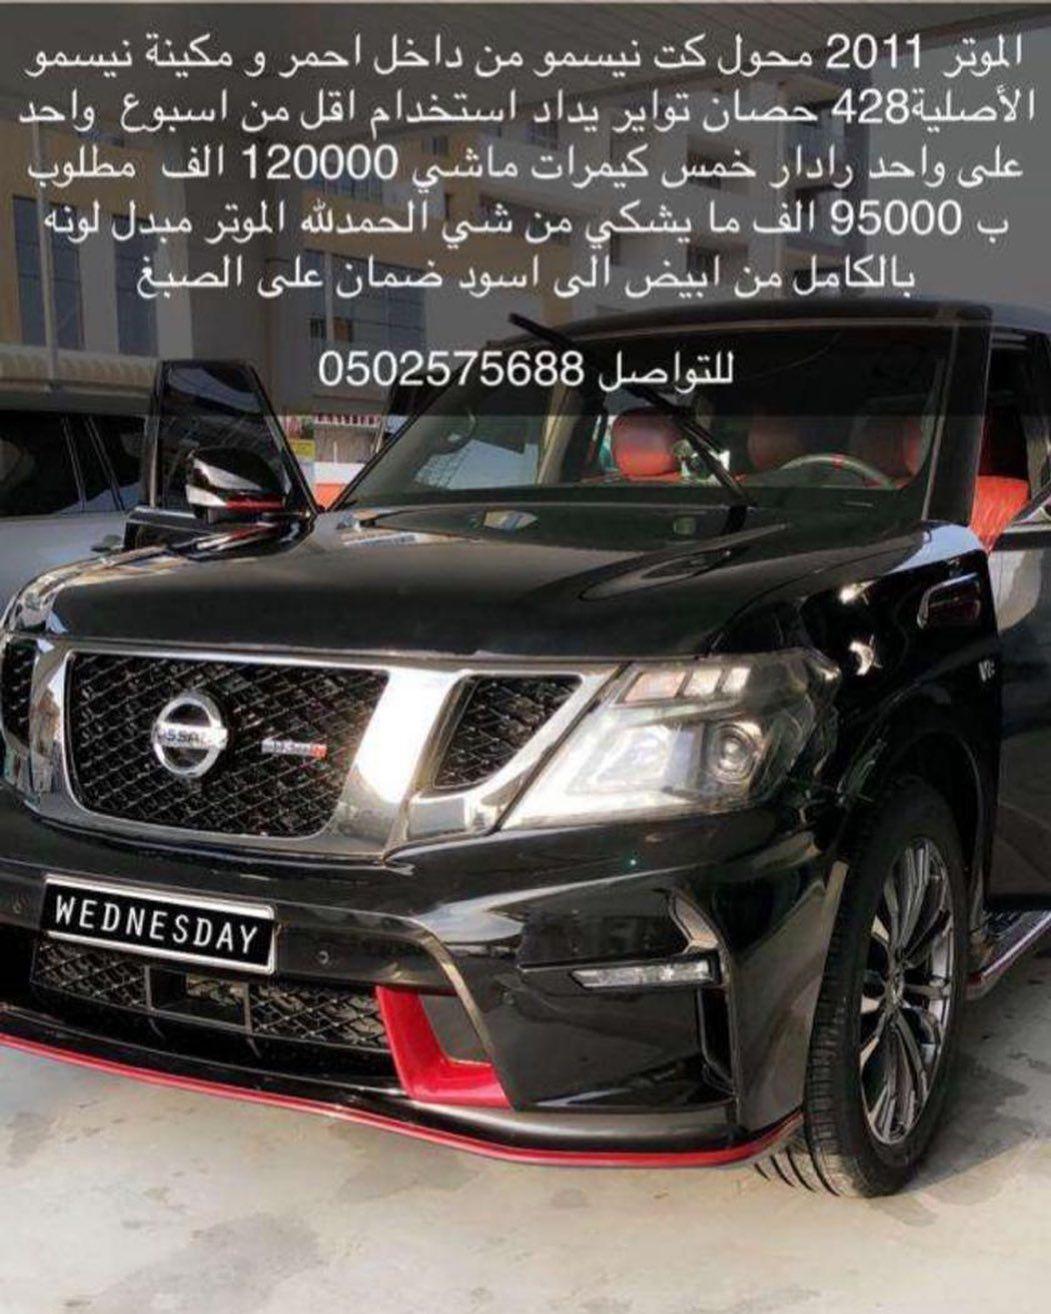 Car Cars Uae Dubai Smsar Dxb Alain Sharjah Ajman العين الشارقة راك أبوظبي سيارات سيارات لل Instagram Posts Blue And White Picture Photo